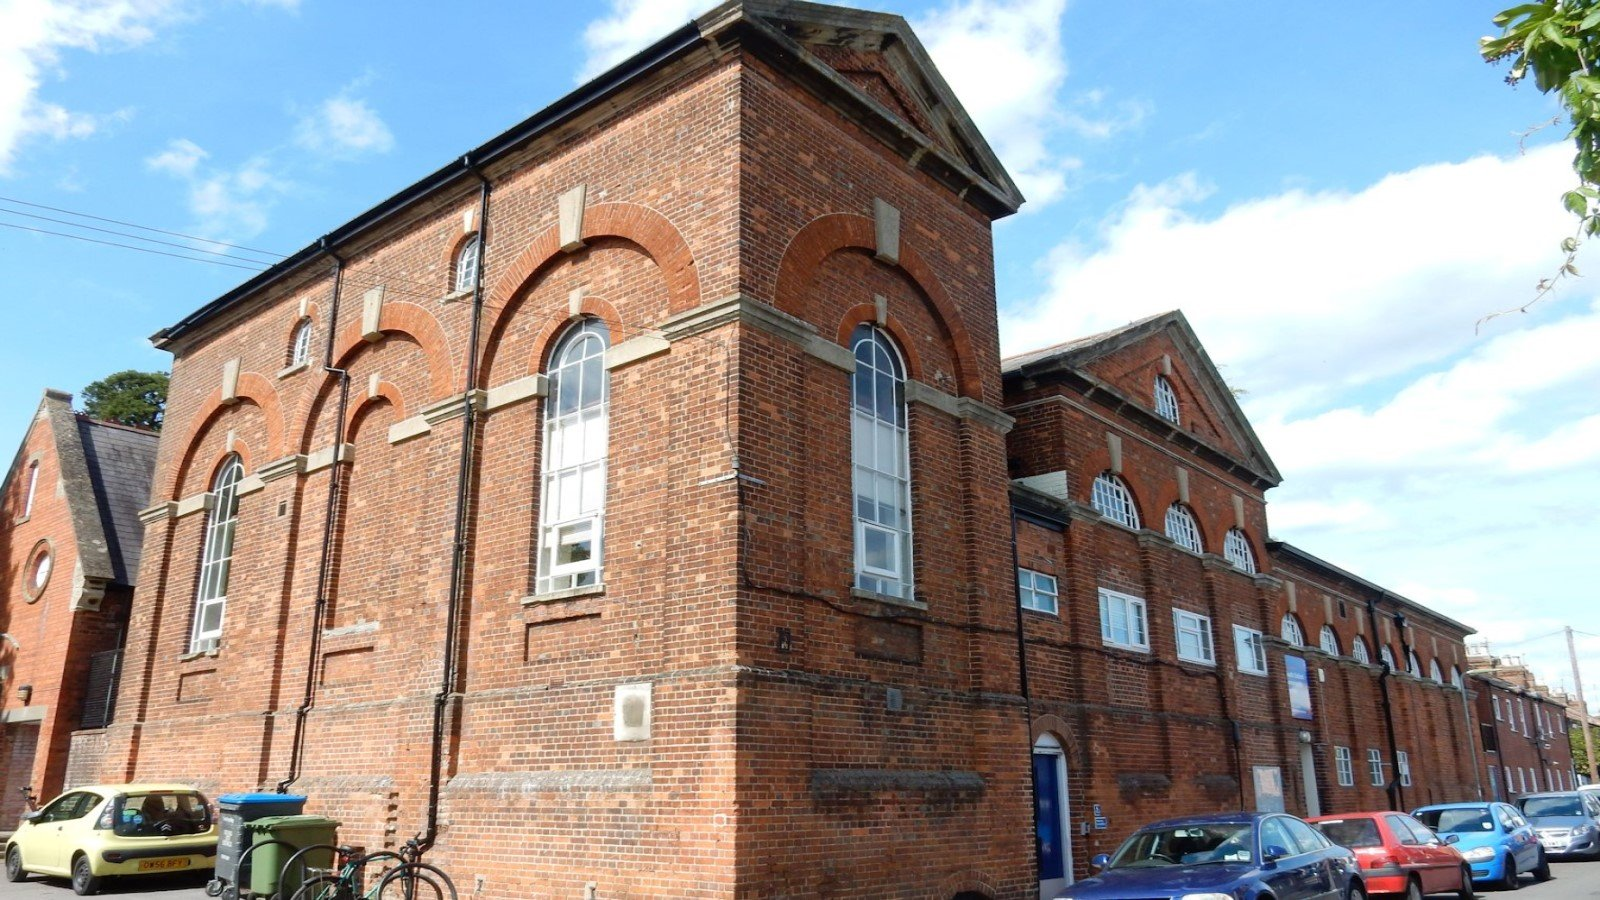 South Oxford Community Centre